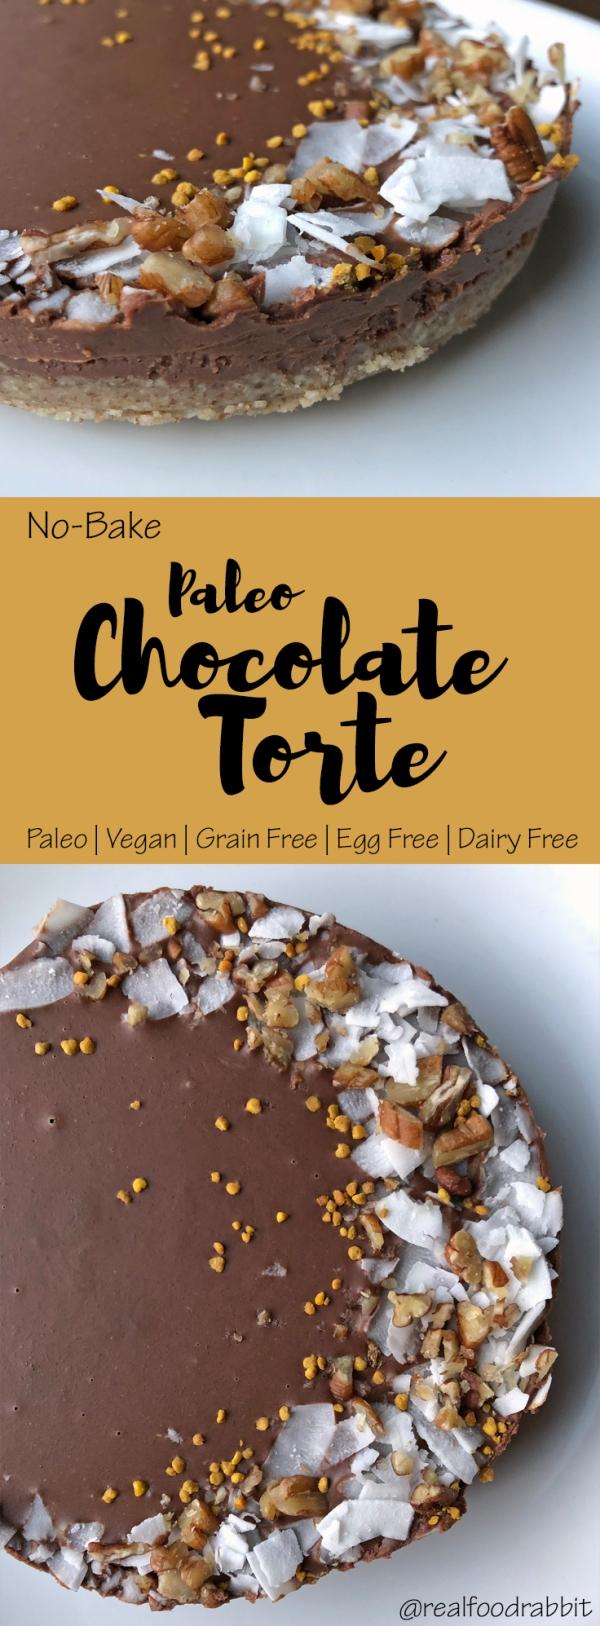 Paleo Chocolate Torte.jpg